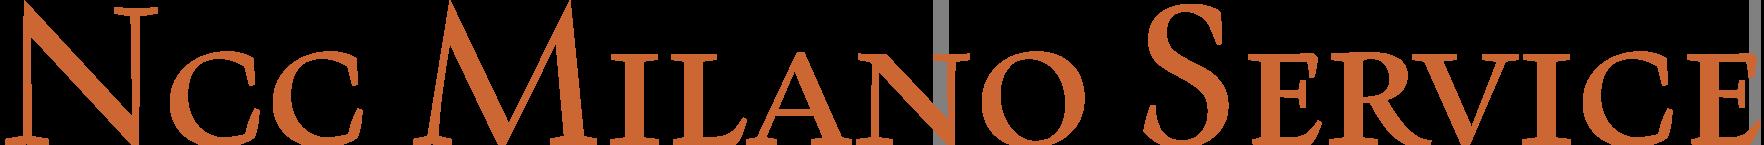 NCC Milano Service